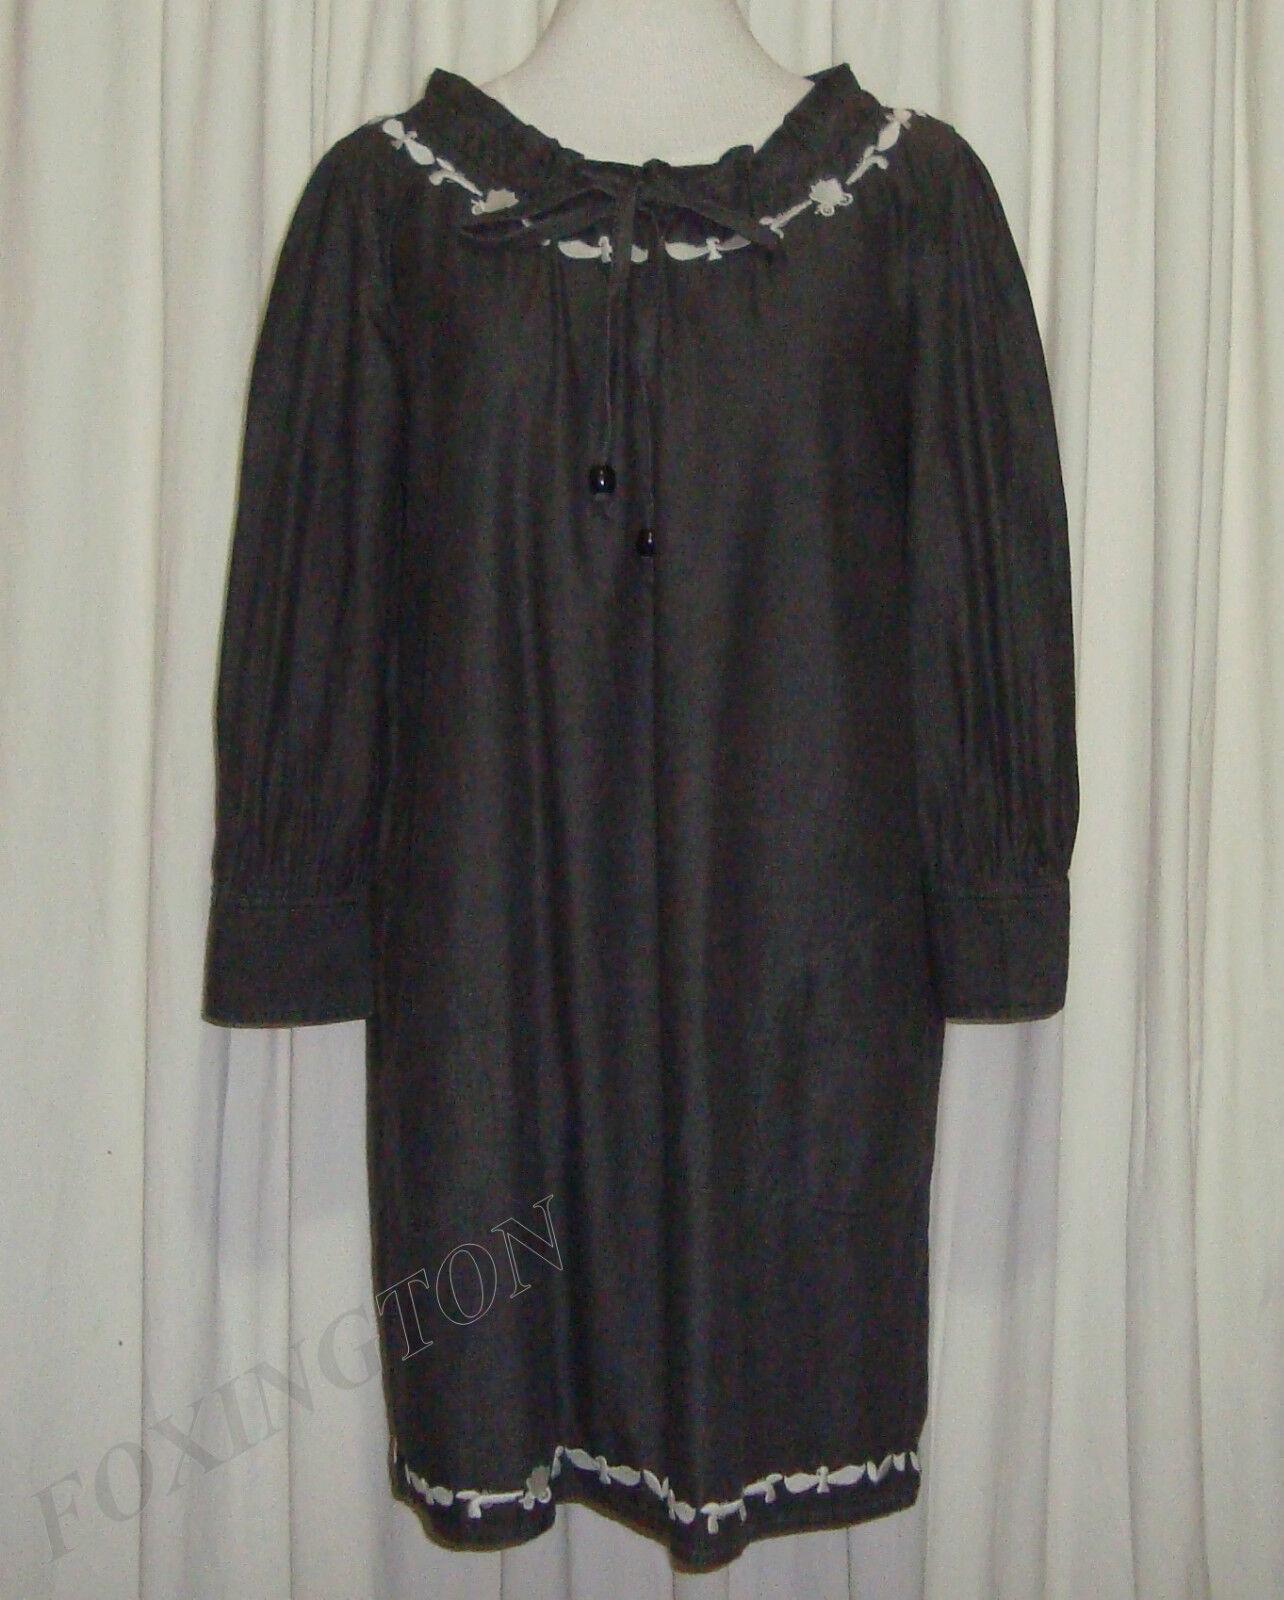 ZIMMERMANN DARK grau EMBROIDErot DRESS MATERNITY DRESS Größe 2 (AUS 12 14,US 6 8)